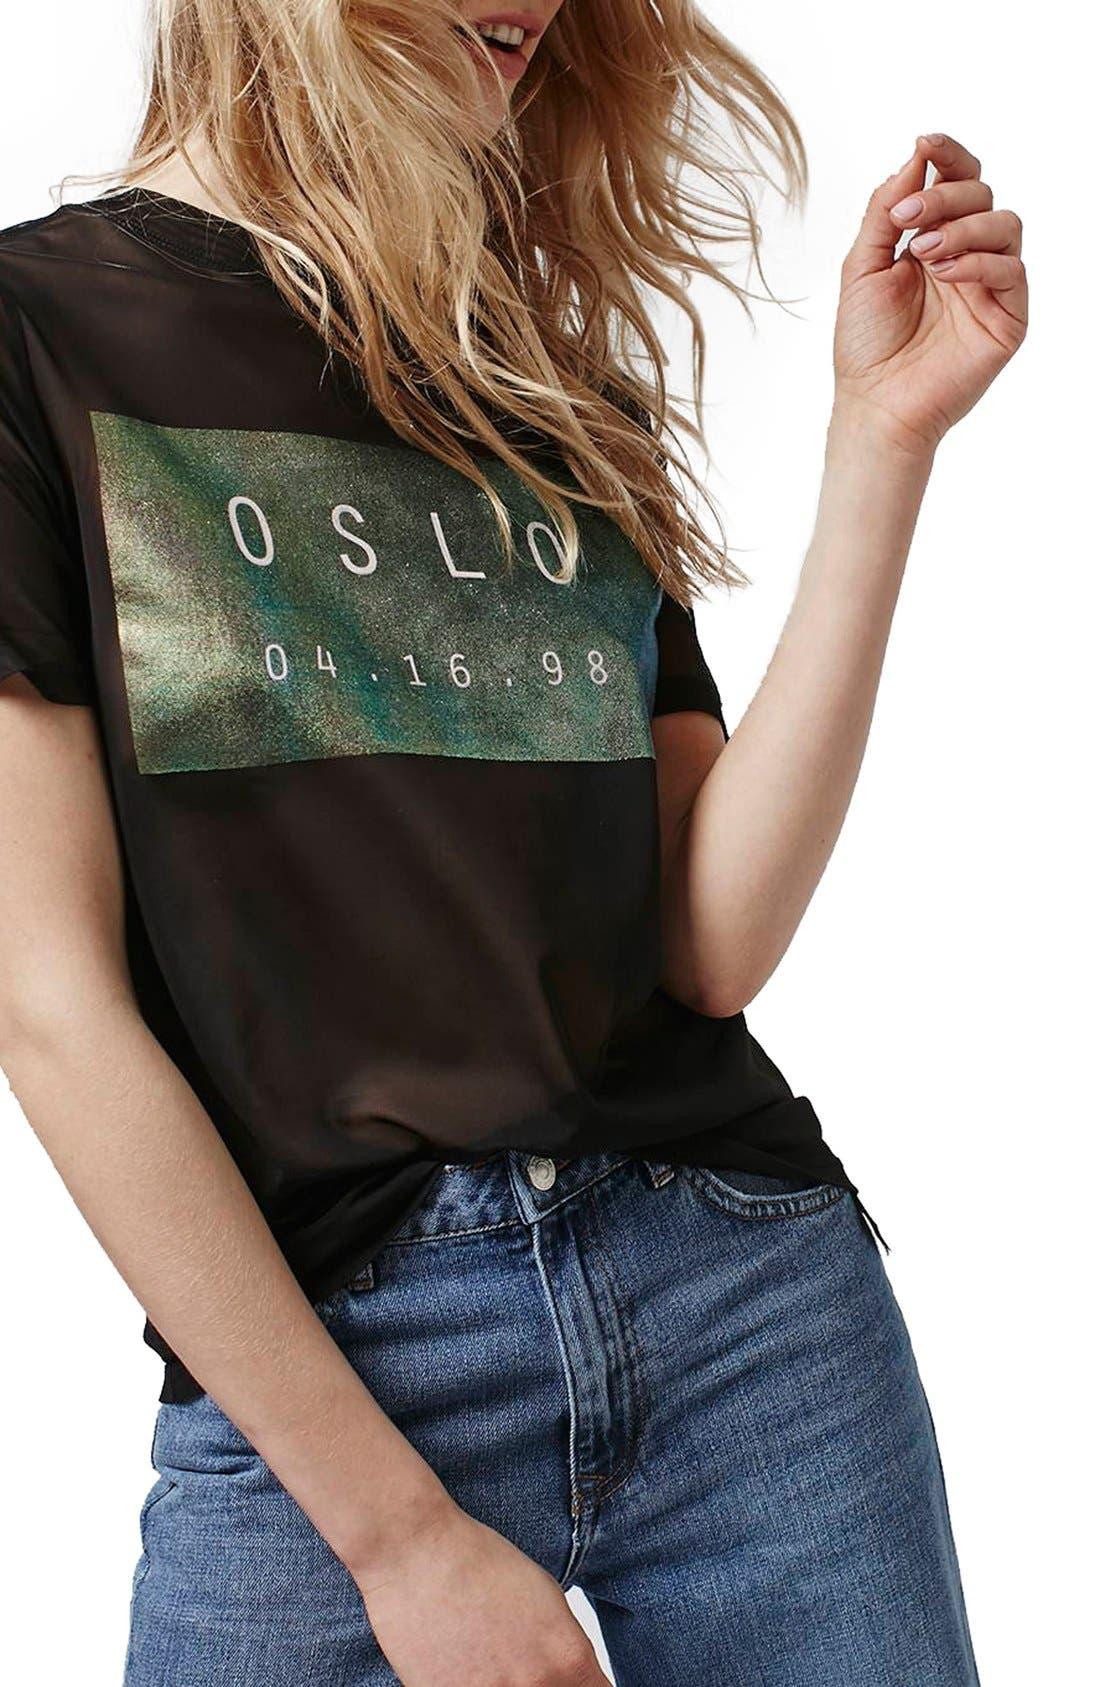 Alternate Image 1 Selected - Topshop 'Oslo' Holographic Sheer Mesh Tee